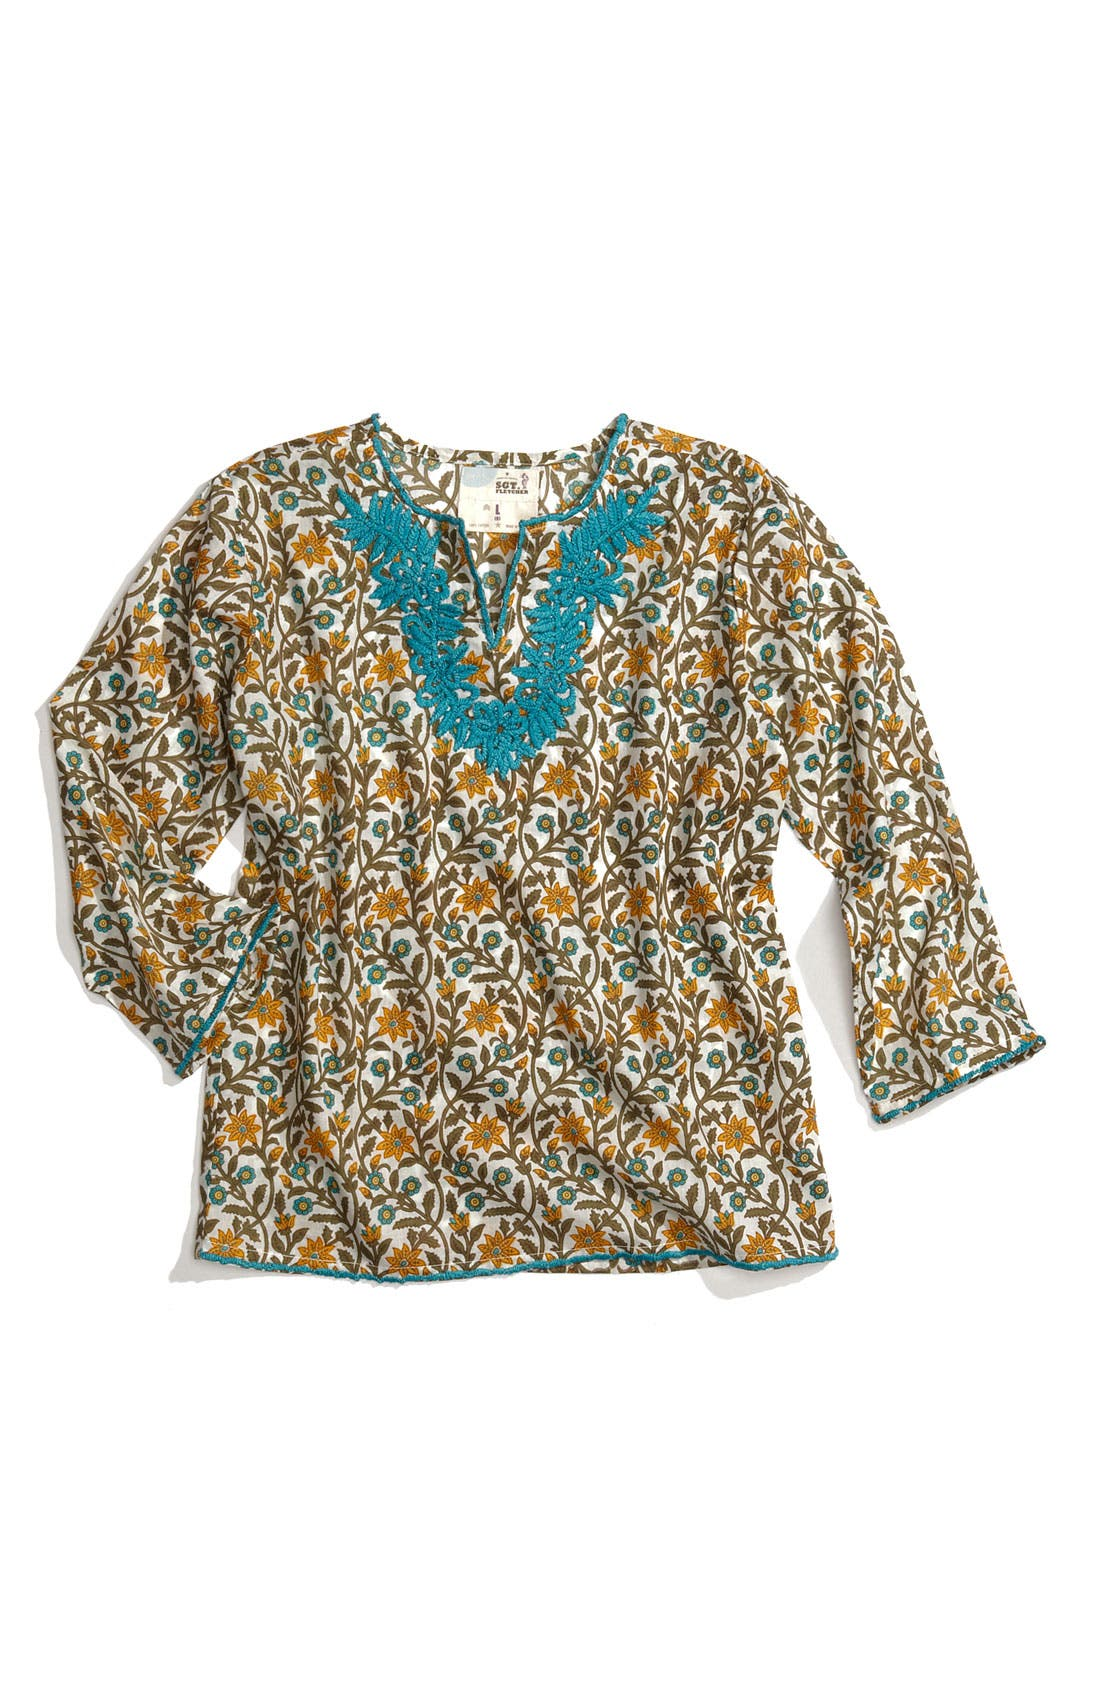 Alternate Image 1 Selected - Peek 'Embroidered Khurti' Top (Big Girls)